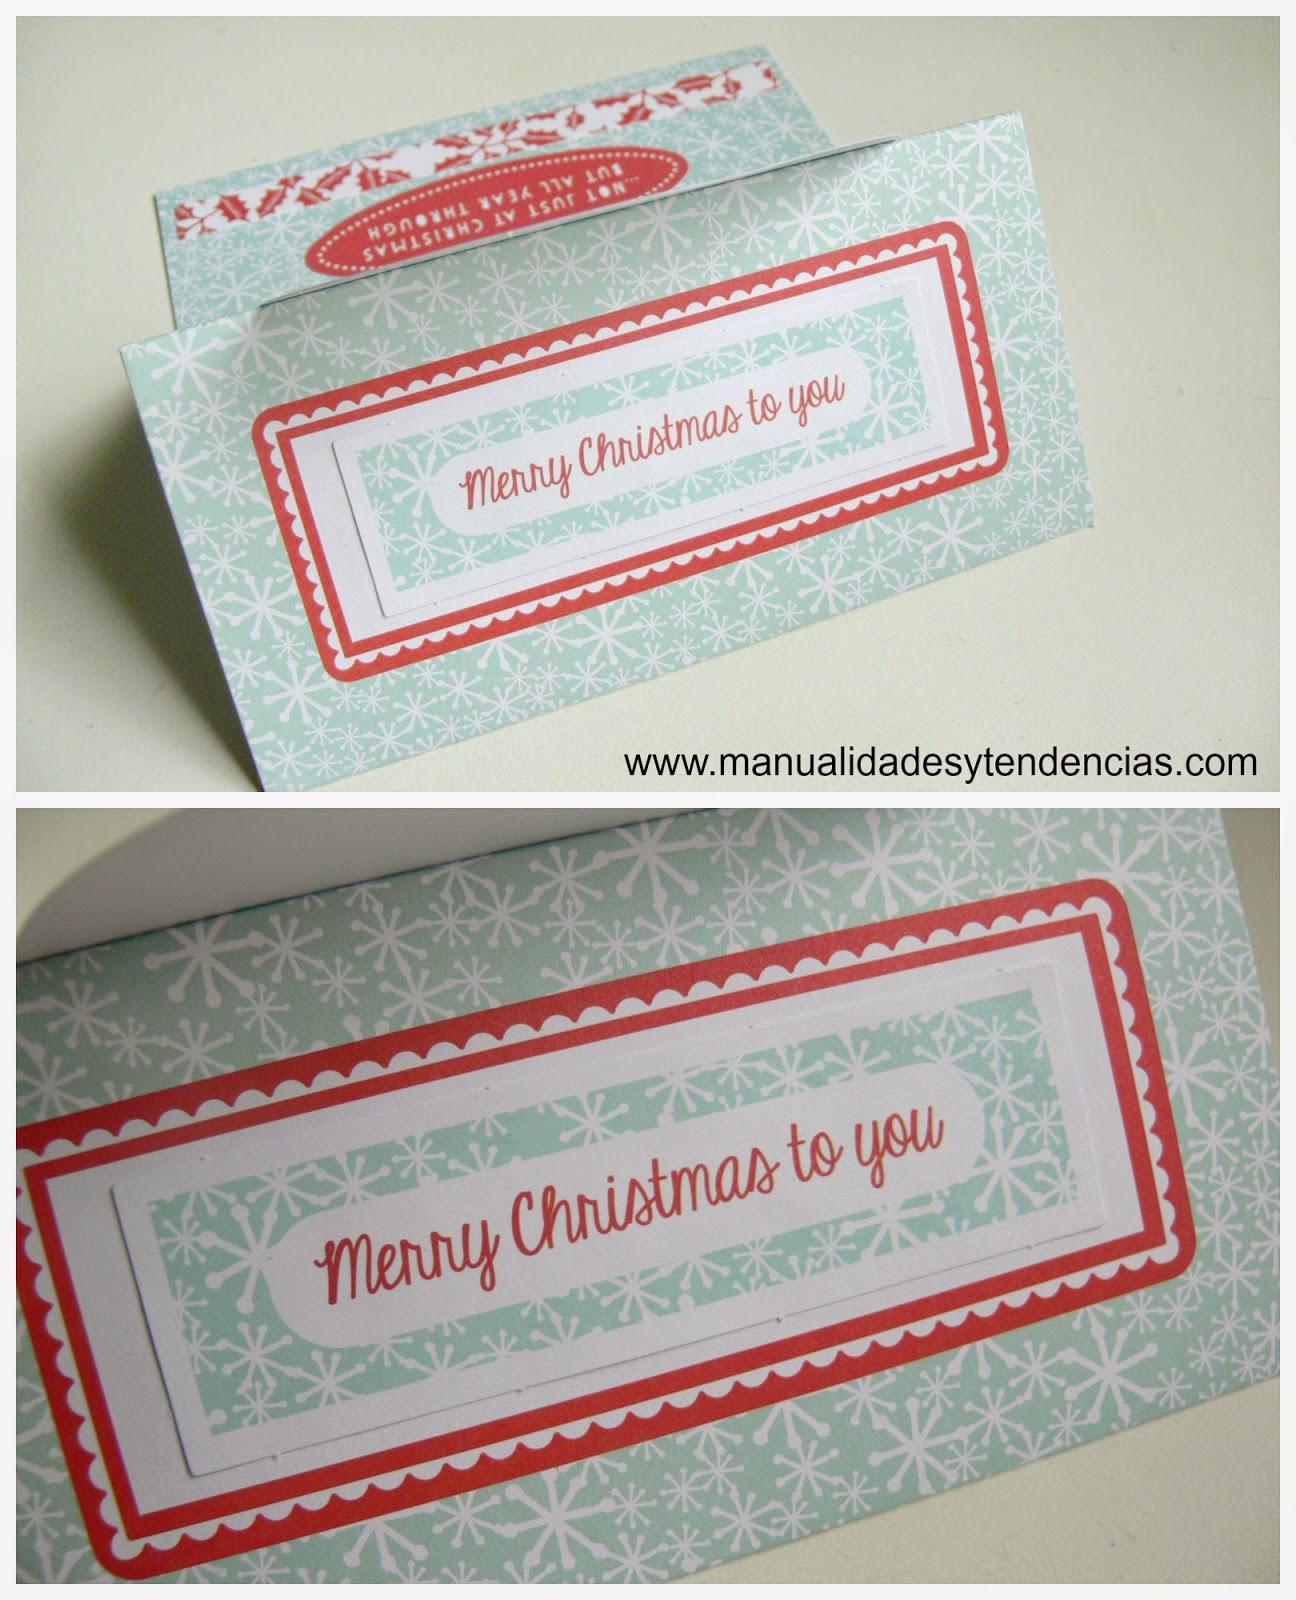 tarjeta navideña hecha a mano / handmade Christmas card